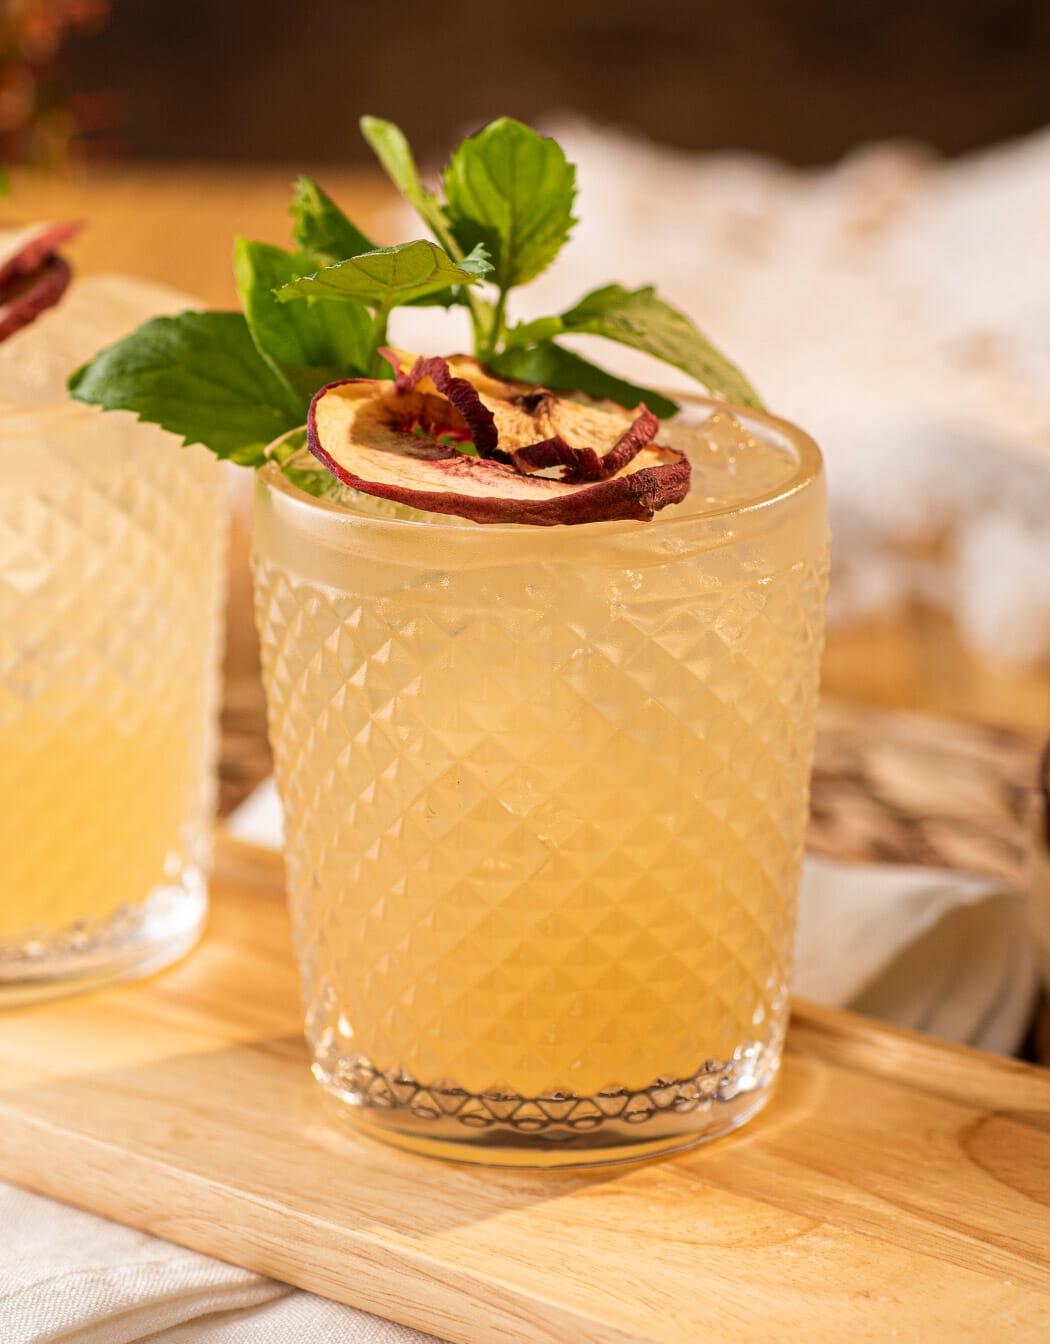 Spanish Peach Margarita cocktail